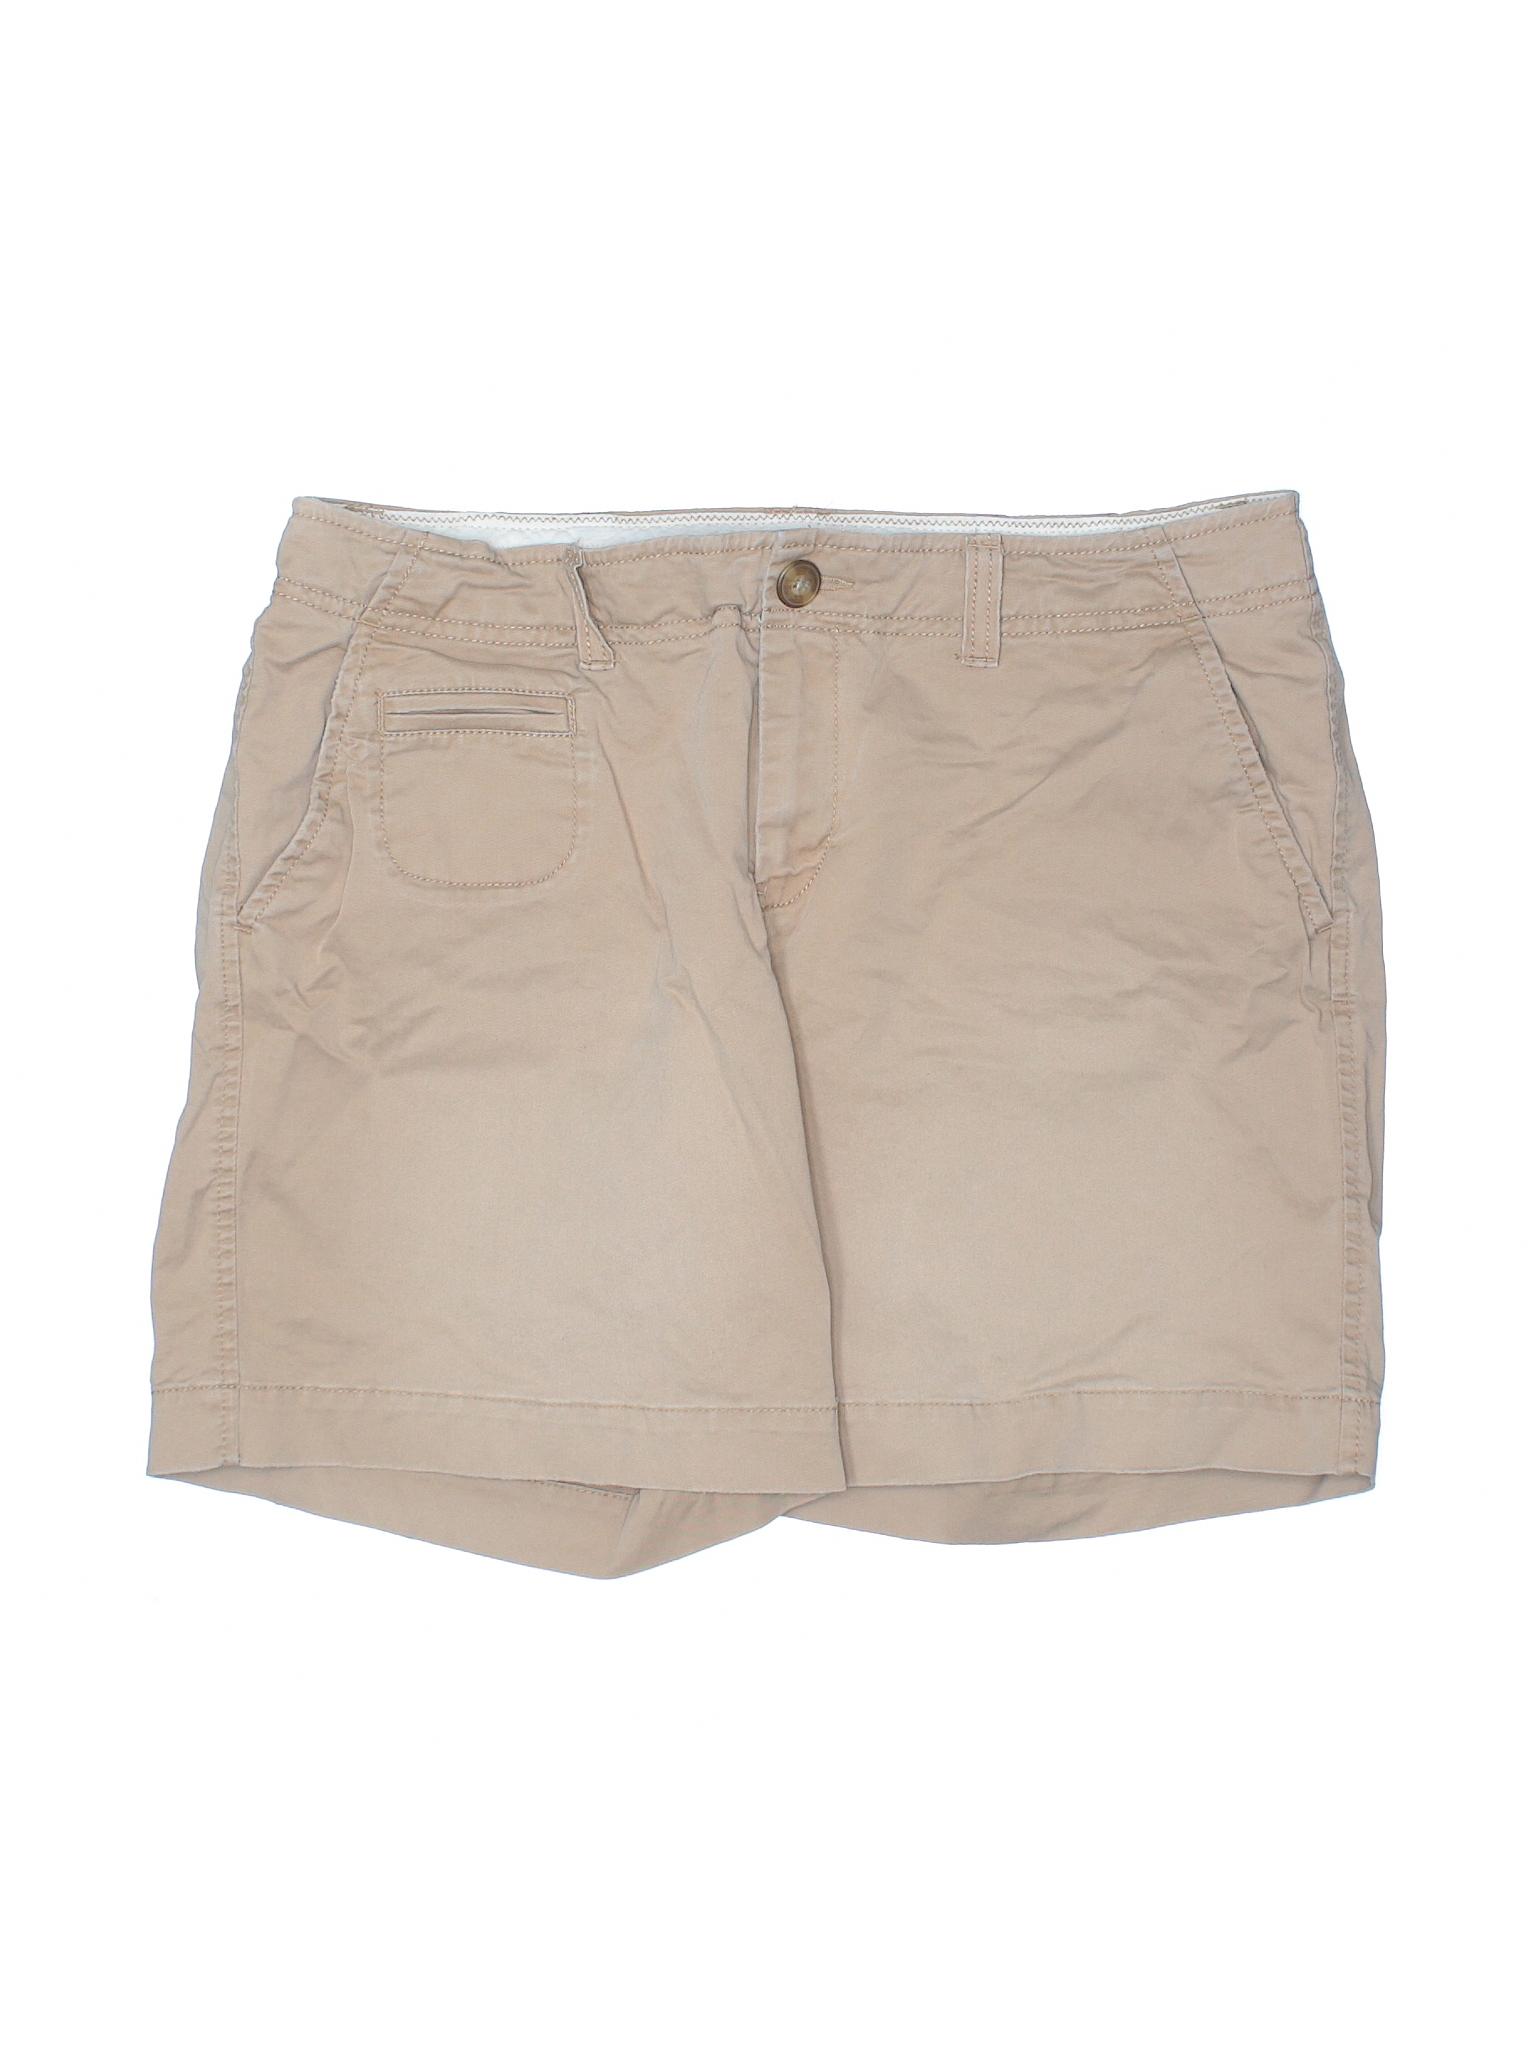 Khaki Navy Leisure Shorts Boutique Old wPOAvUxS